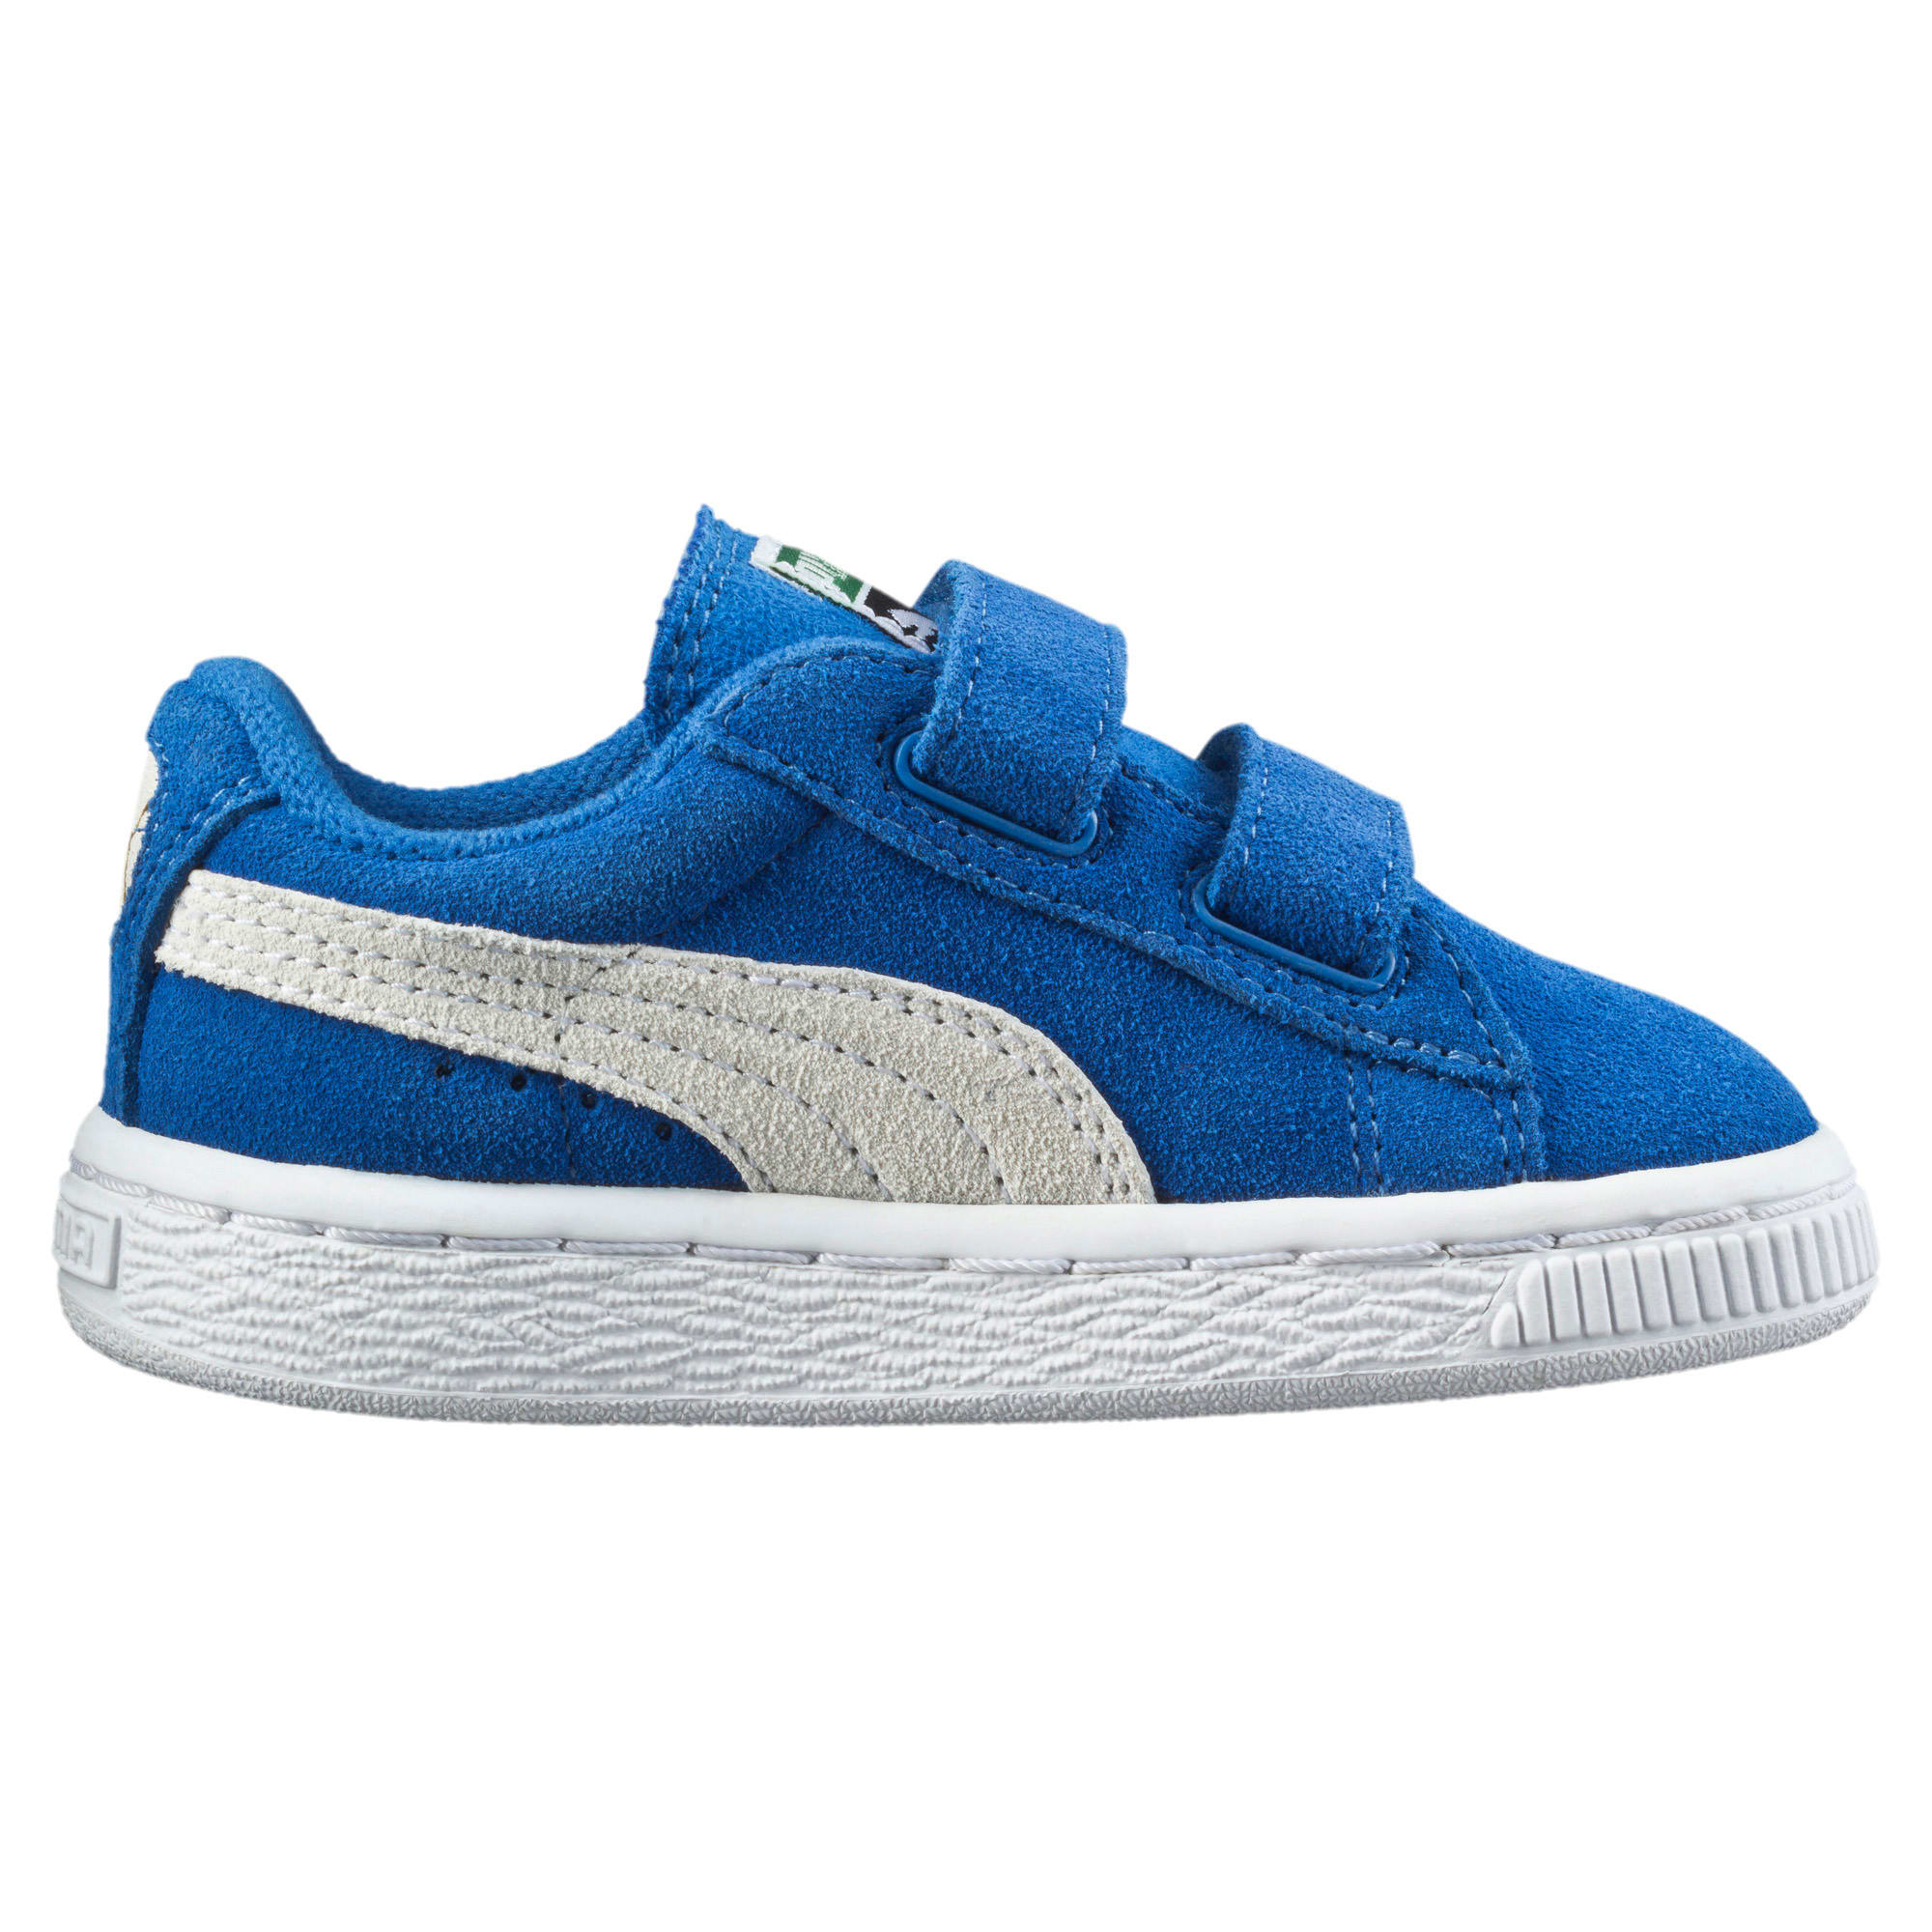 Thumbnail 4 of Suede Preschool Sneaker mit 2 Riemen, Snorkel Blue-Puma White, medium